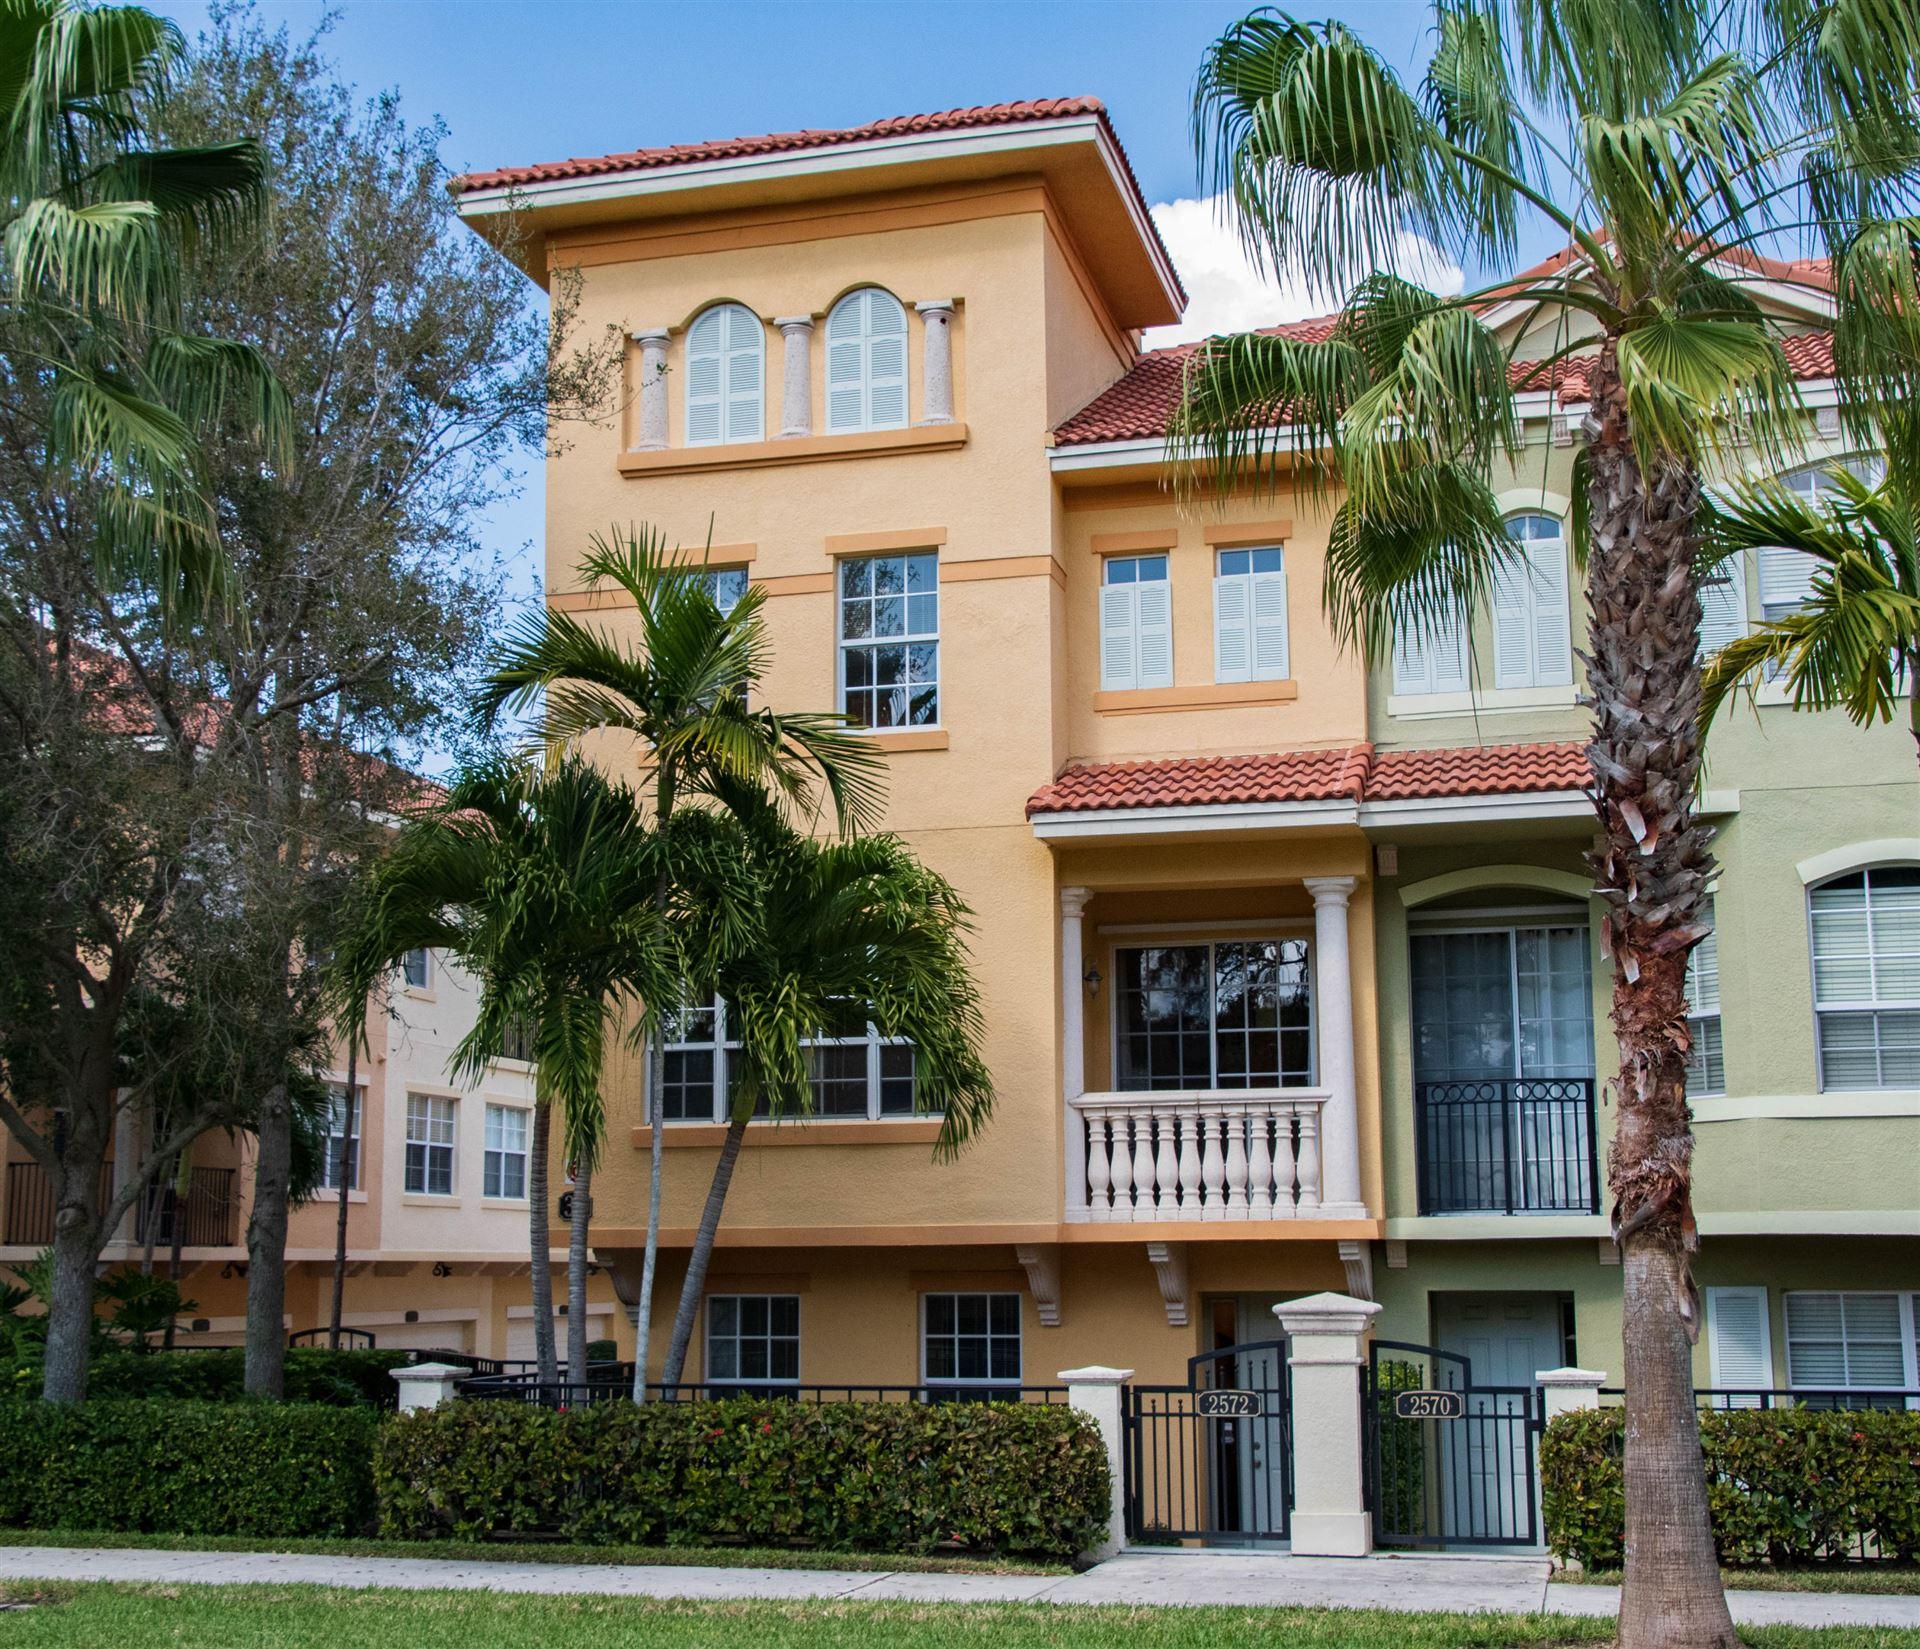 2572 Gardens Parkway, Palm Beach Gardens, FL 33410 - #: RX-10643520